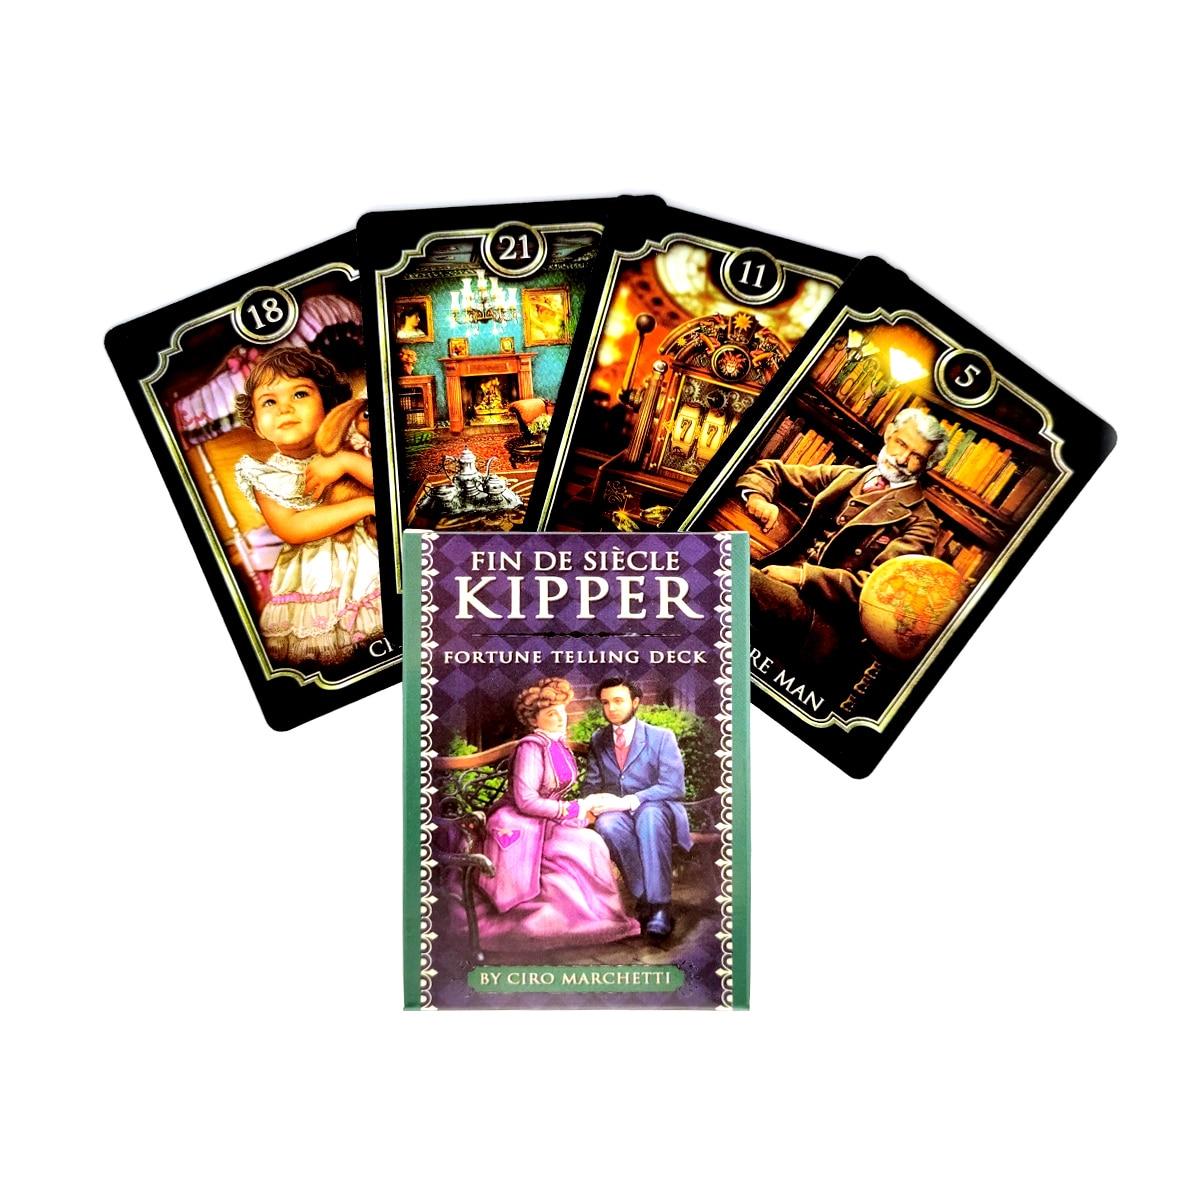 Fin De Siecle Kipper Fortune Telling Deck Tarot Cards Mystical Guidance Deck Divination Entertainment Partys Board Game 39PCS kipper fortune telling deck altar divination tarot oracle cards for card board game accessories